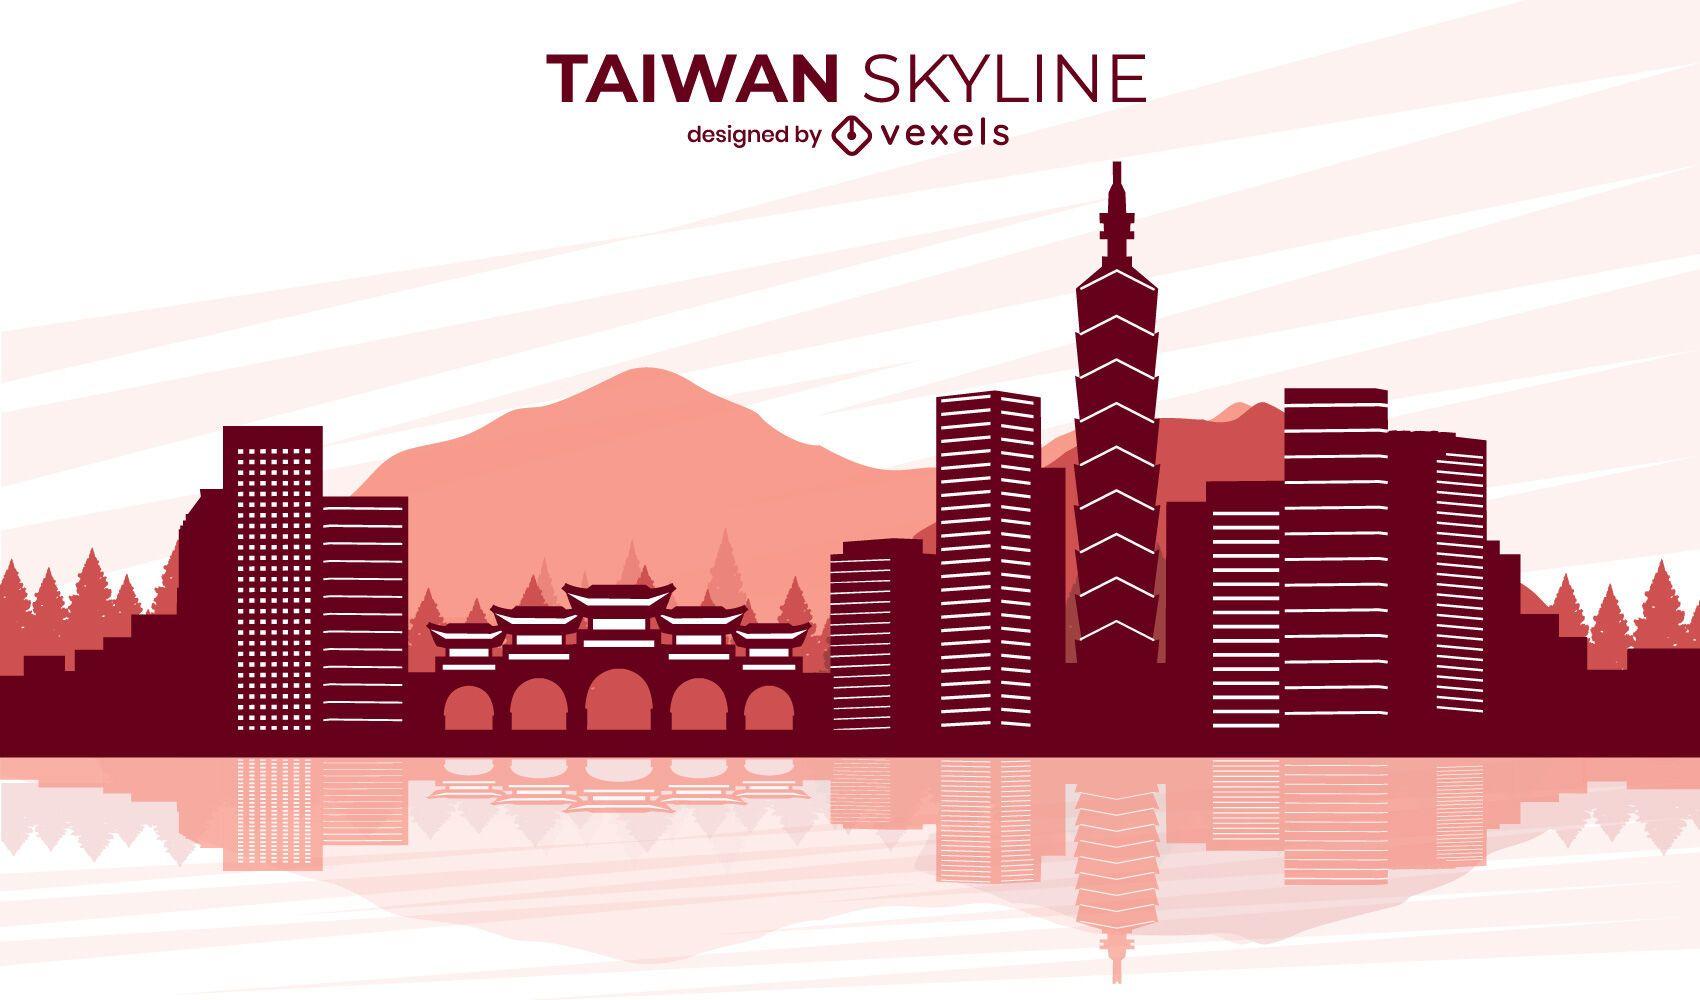 Taiwan city landscape skyline design